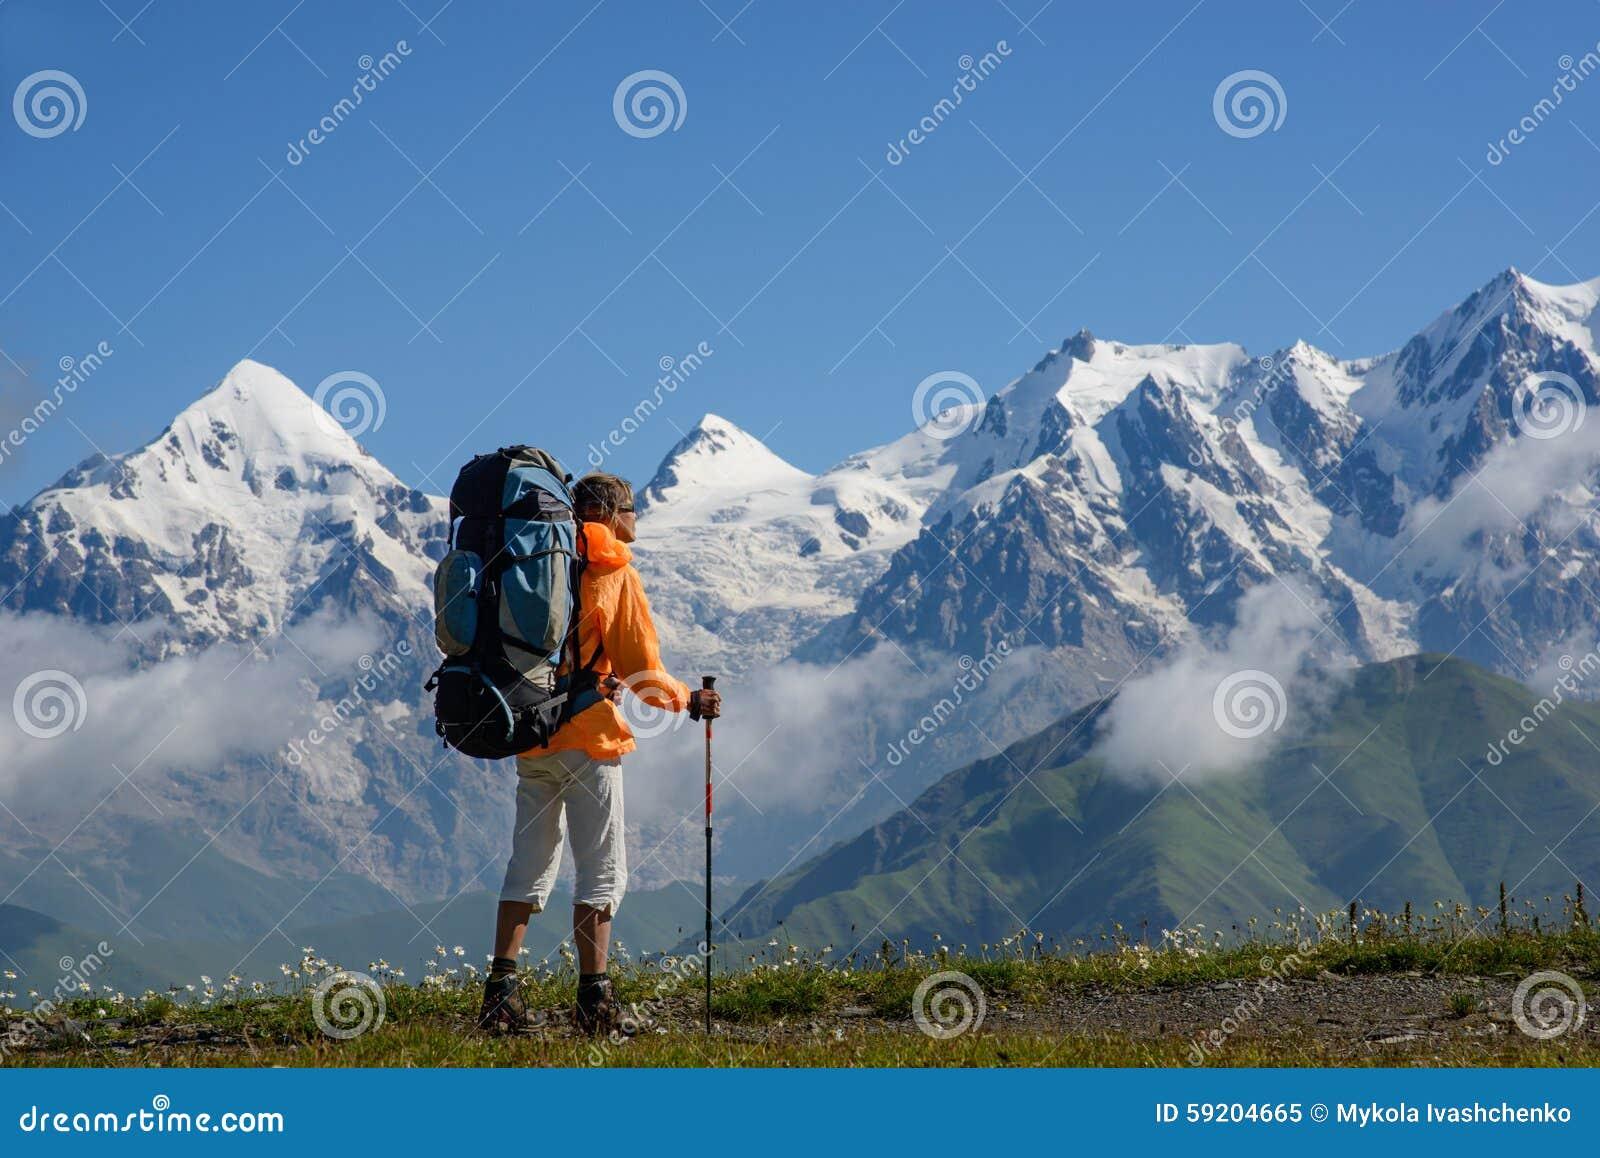 People Hiking On Snow , Svaneti Landscape Stock Photo ...